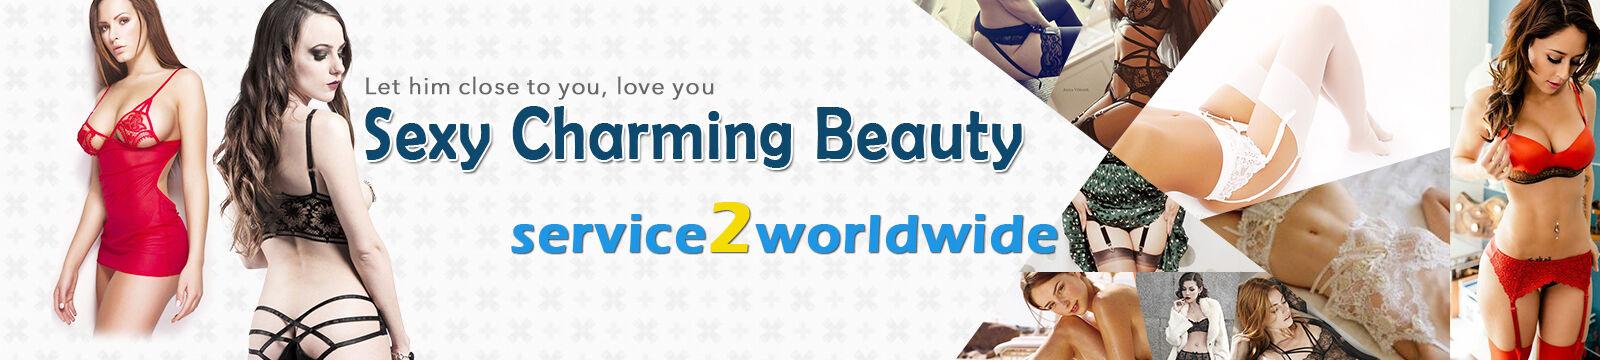 Service2worldwide